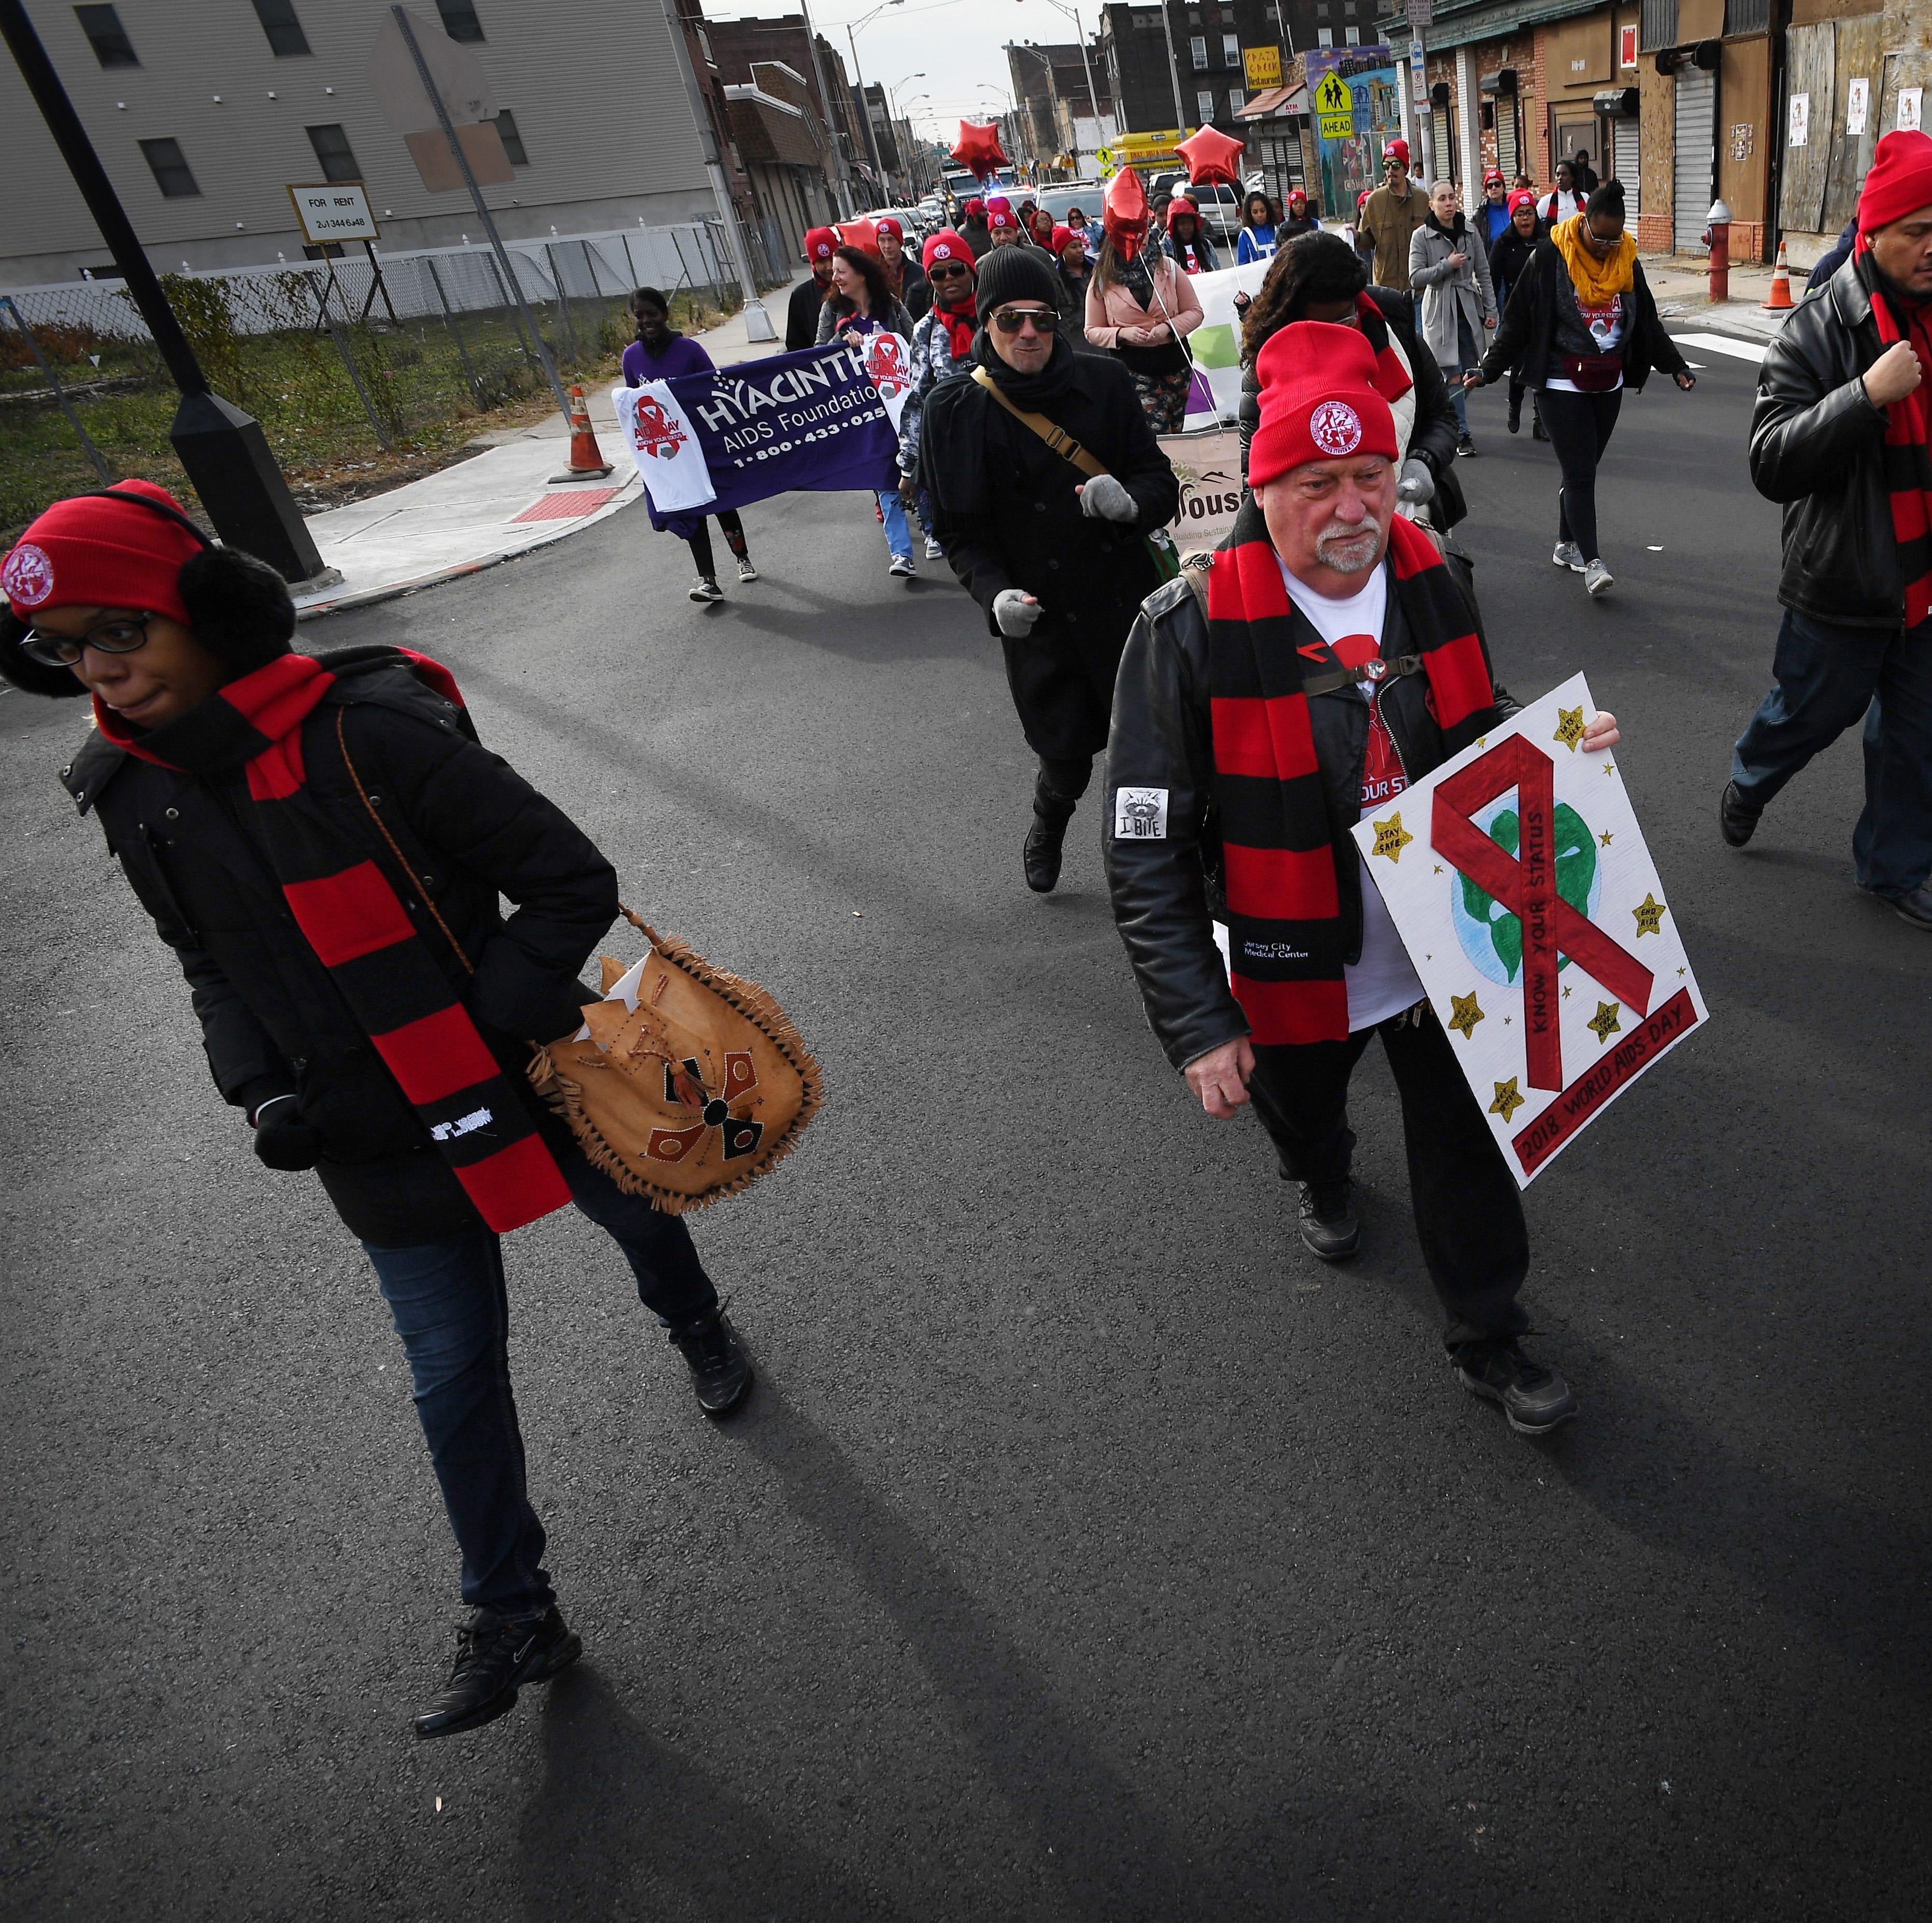 World AIDS Day: Walk in Jersey City raises awareness